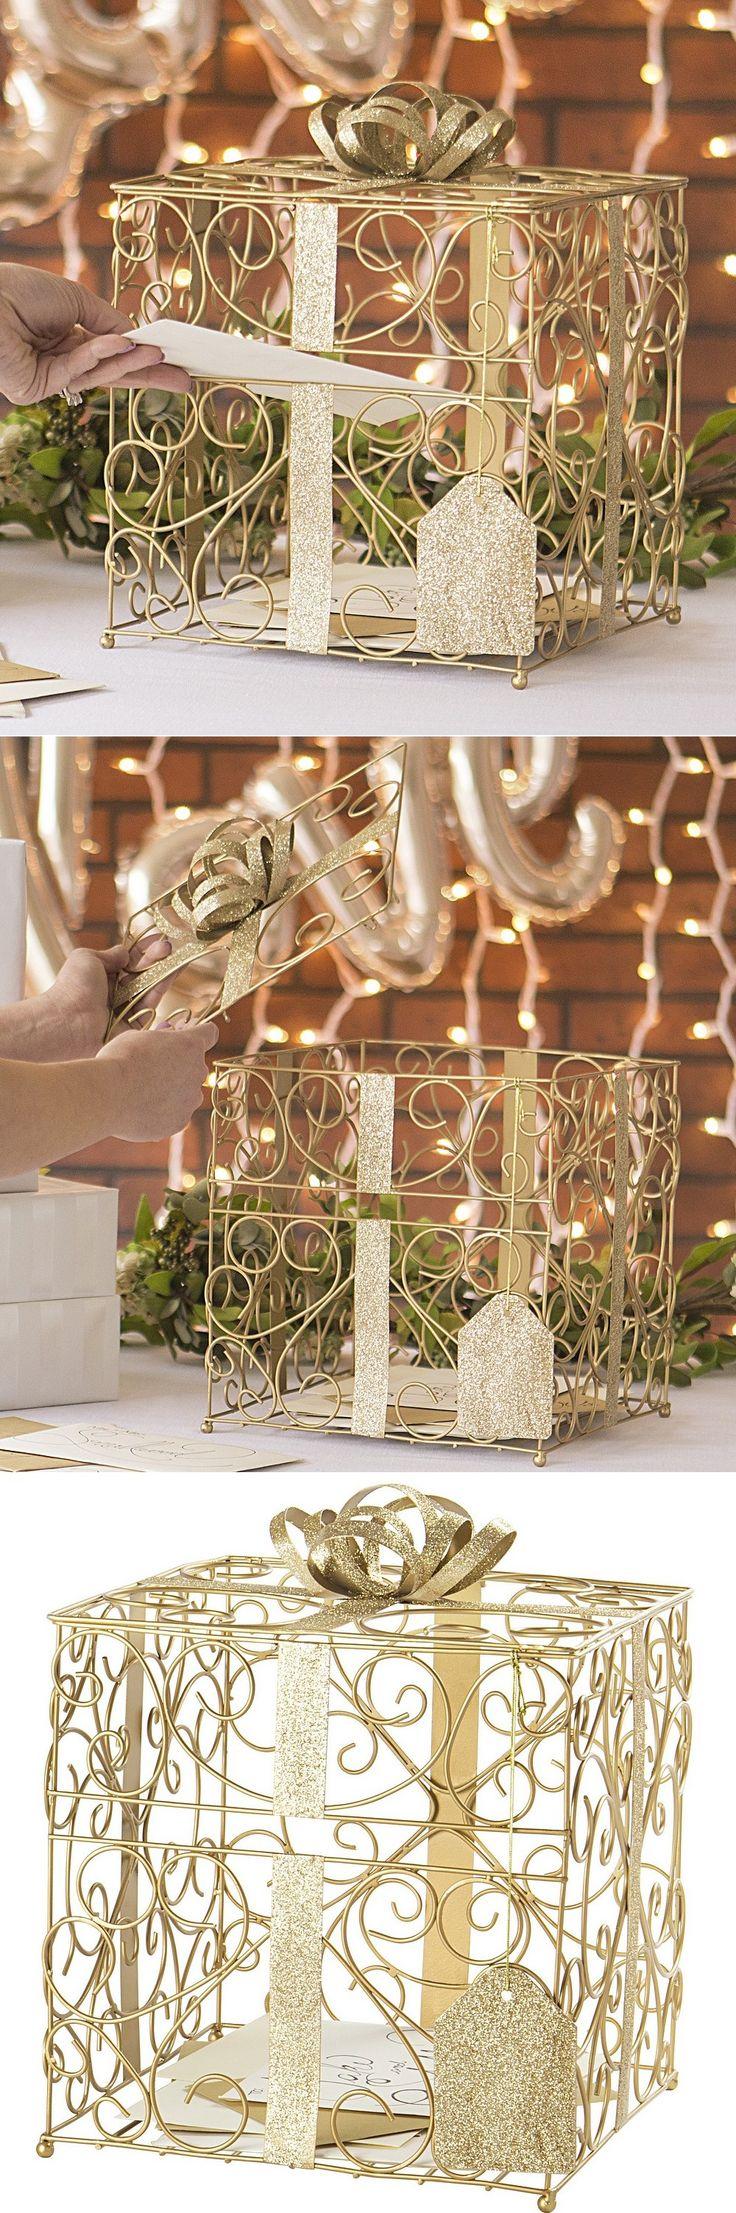 88 Best Gift Card Holder Ideas Images On Pinterest Wedding Cards